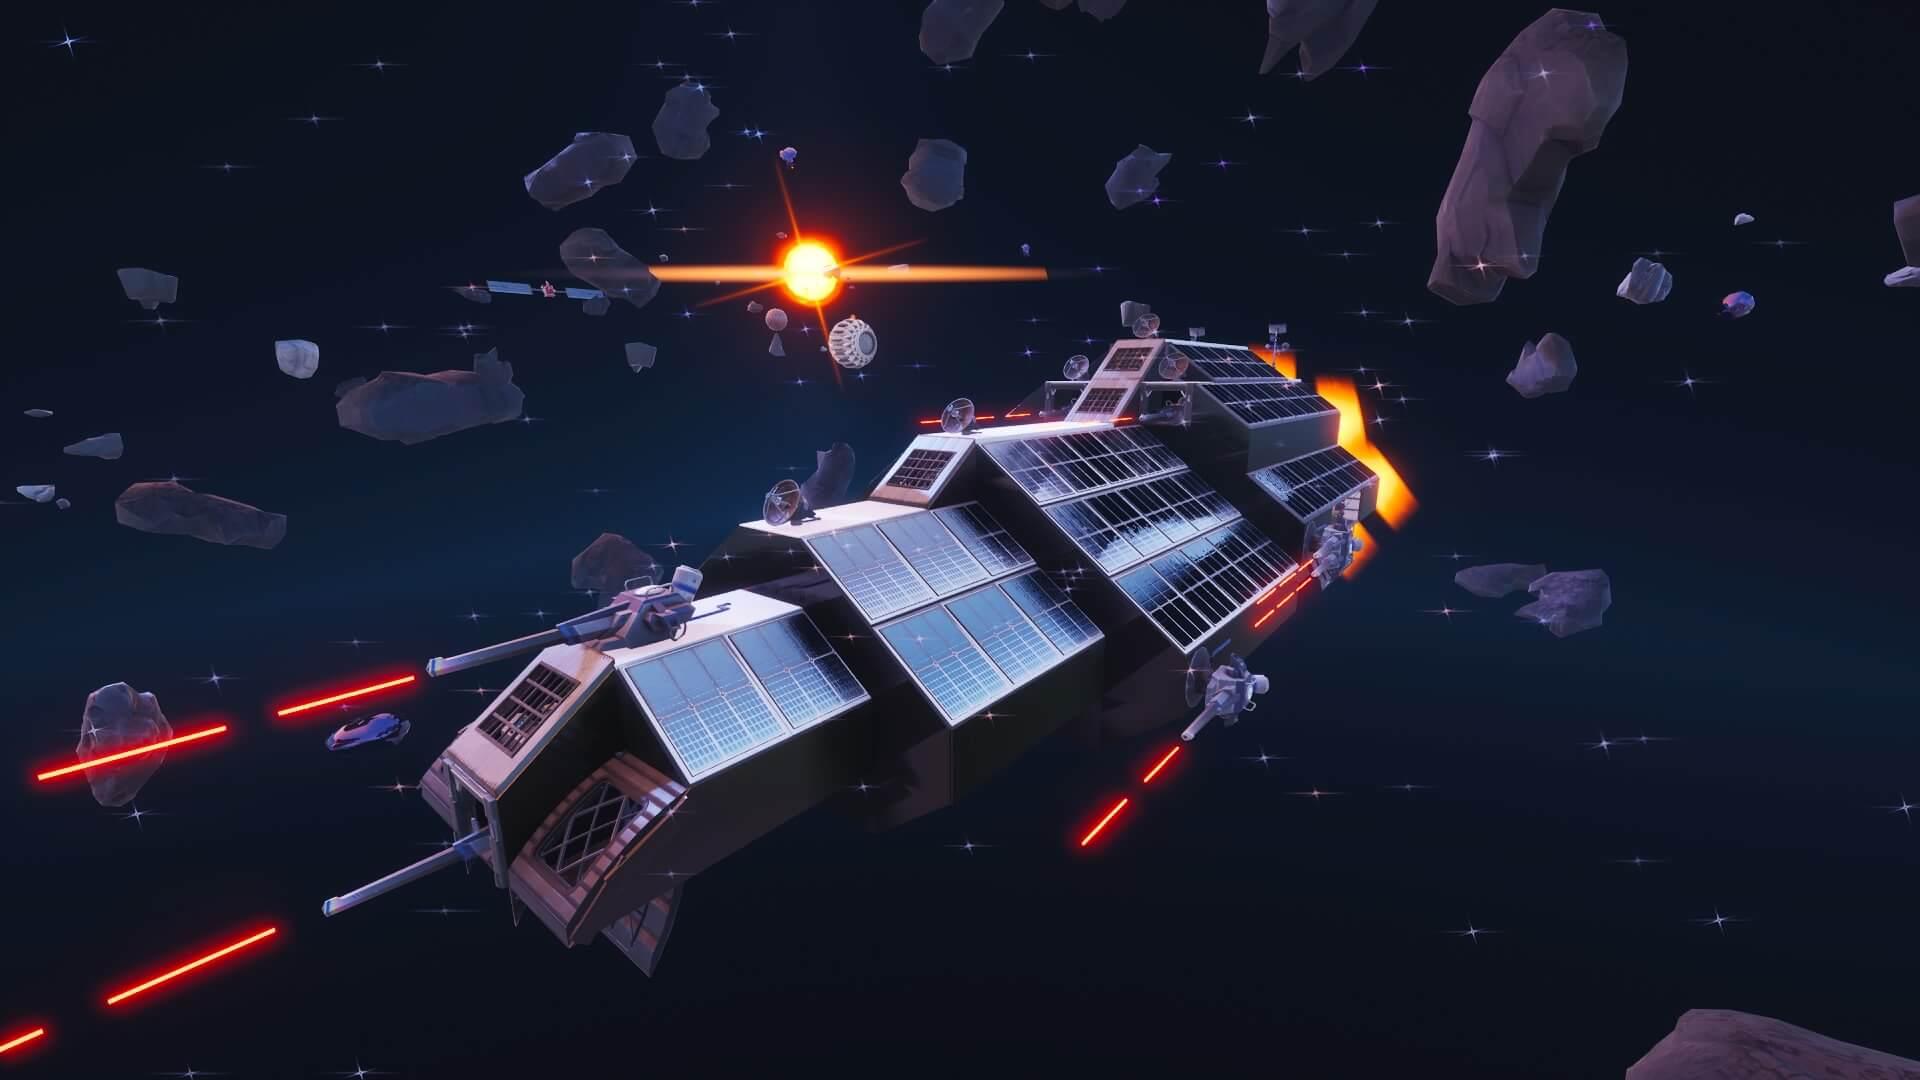 SPACE.EXE - Fortnite Creative Codes - Dropnite.com